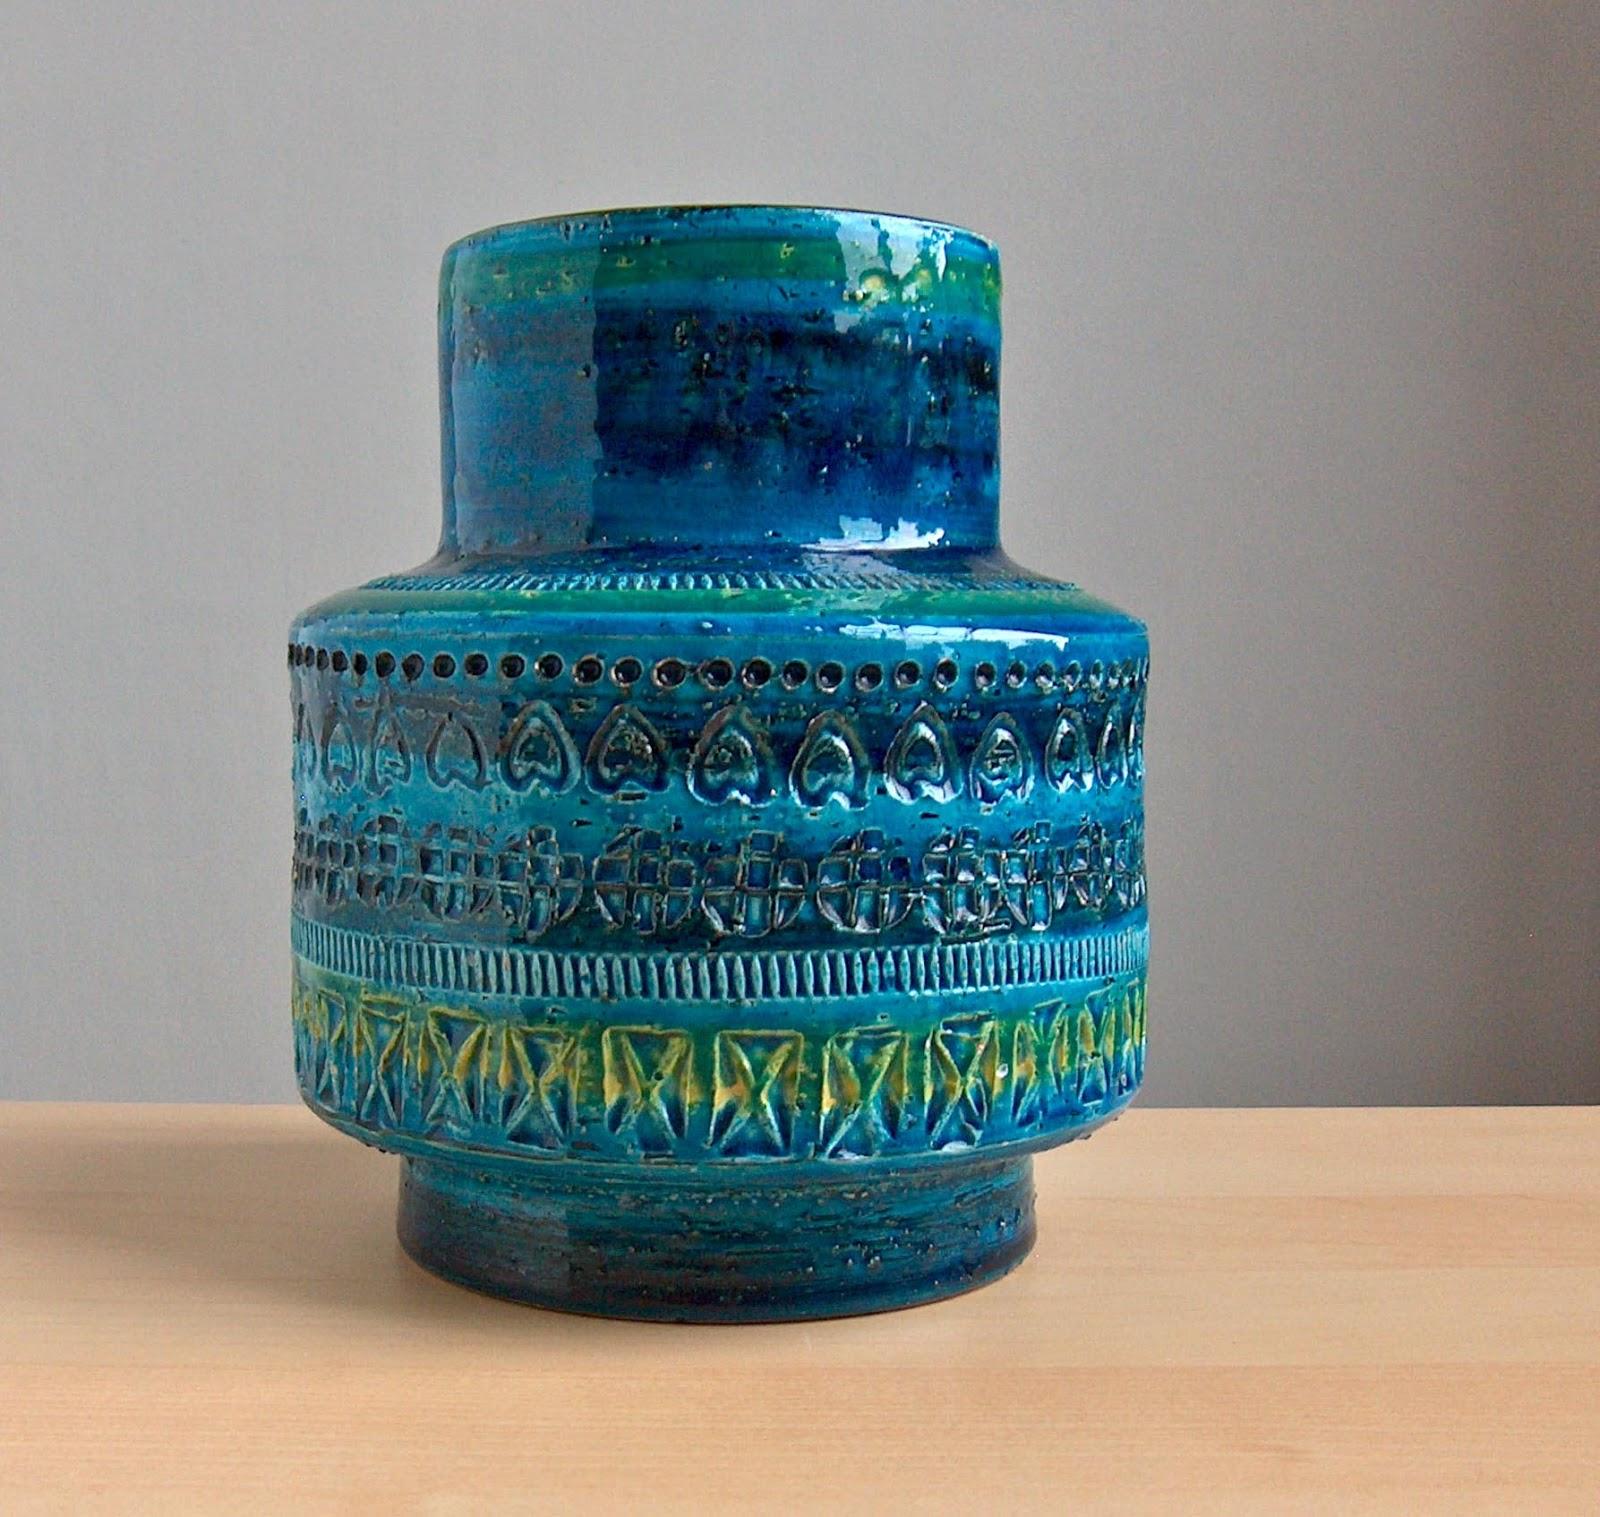 Potshots Rimini Blue Vases By Bitossi Rediscovered